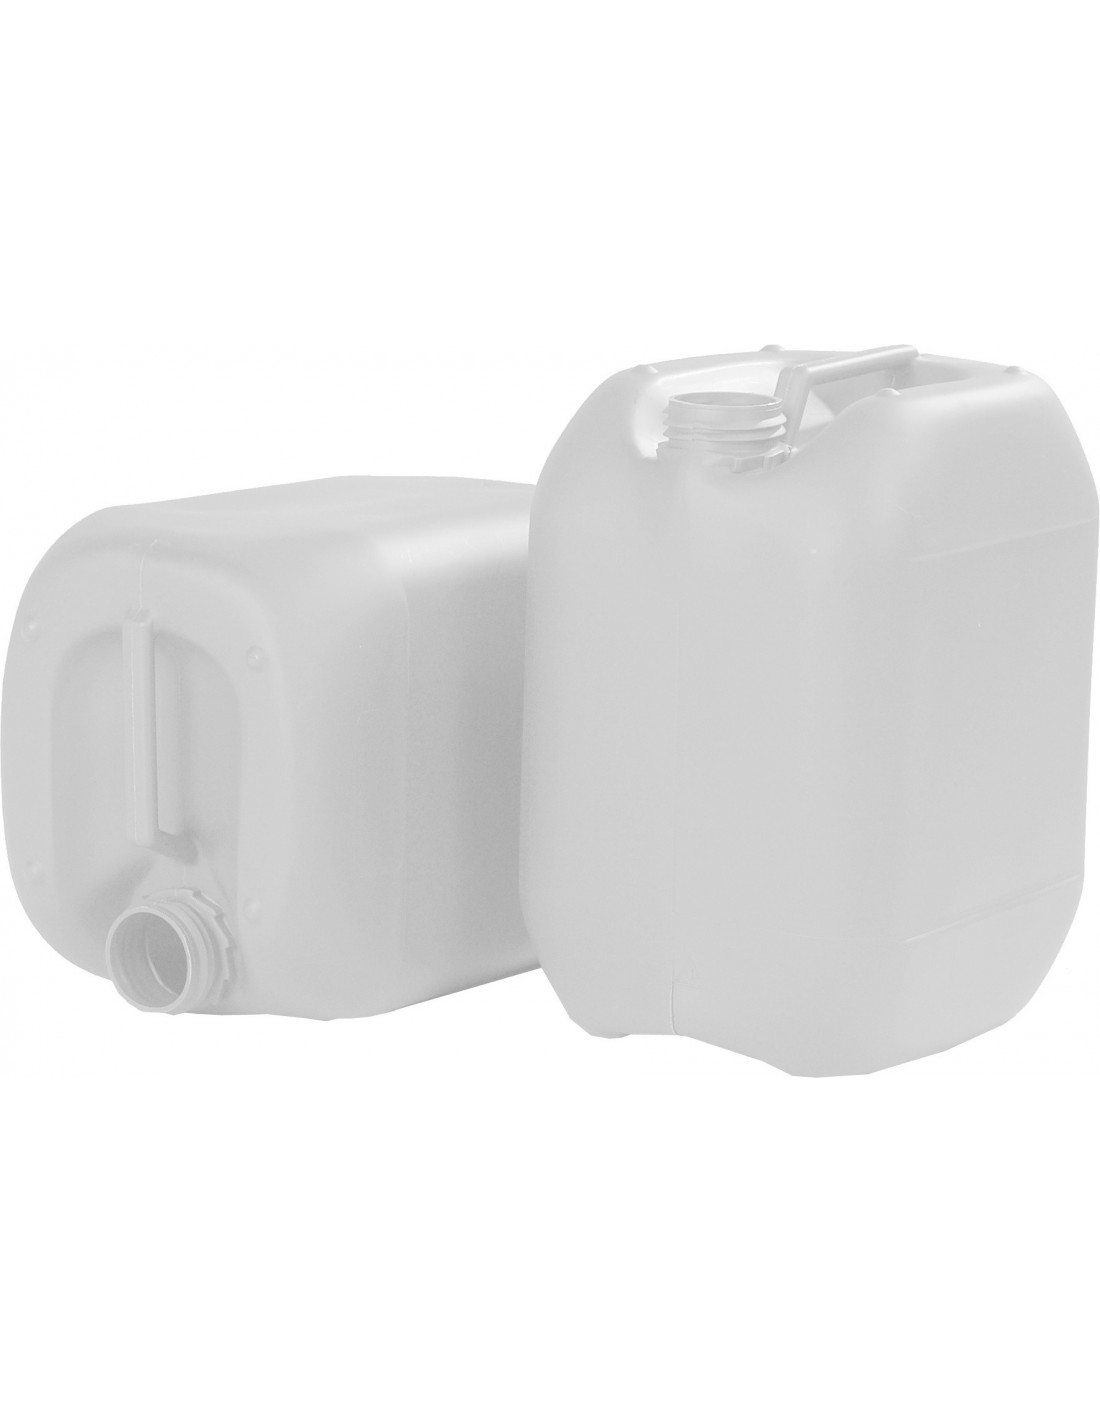 25 Liter Kanister UN-X, ohne Verschluss